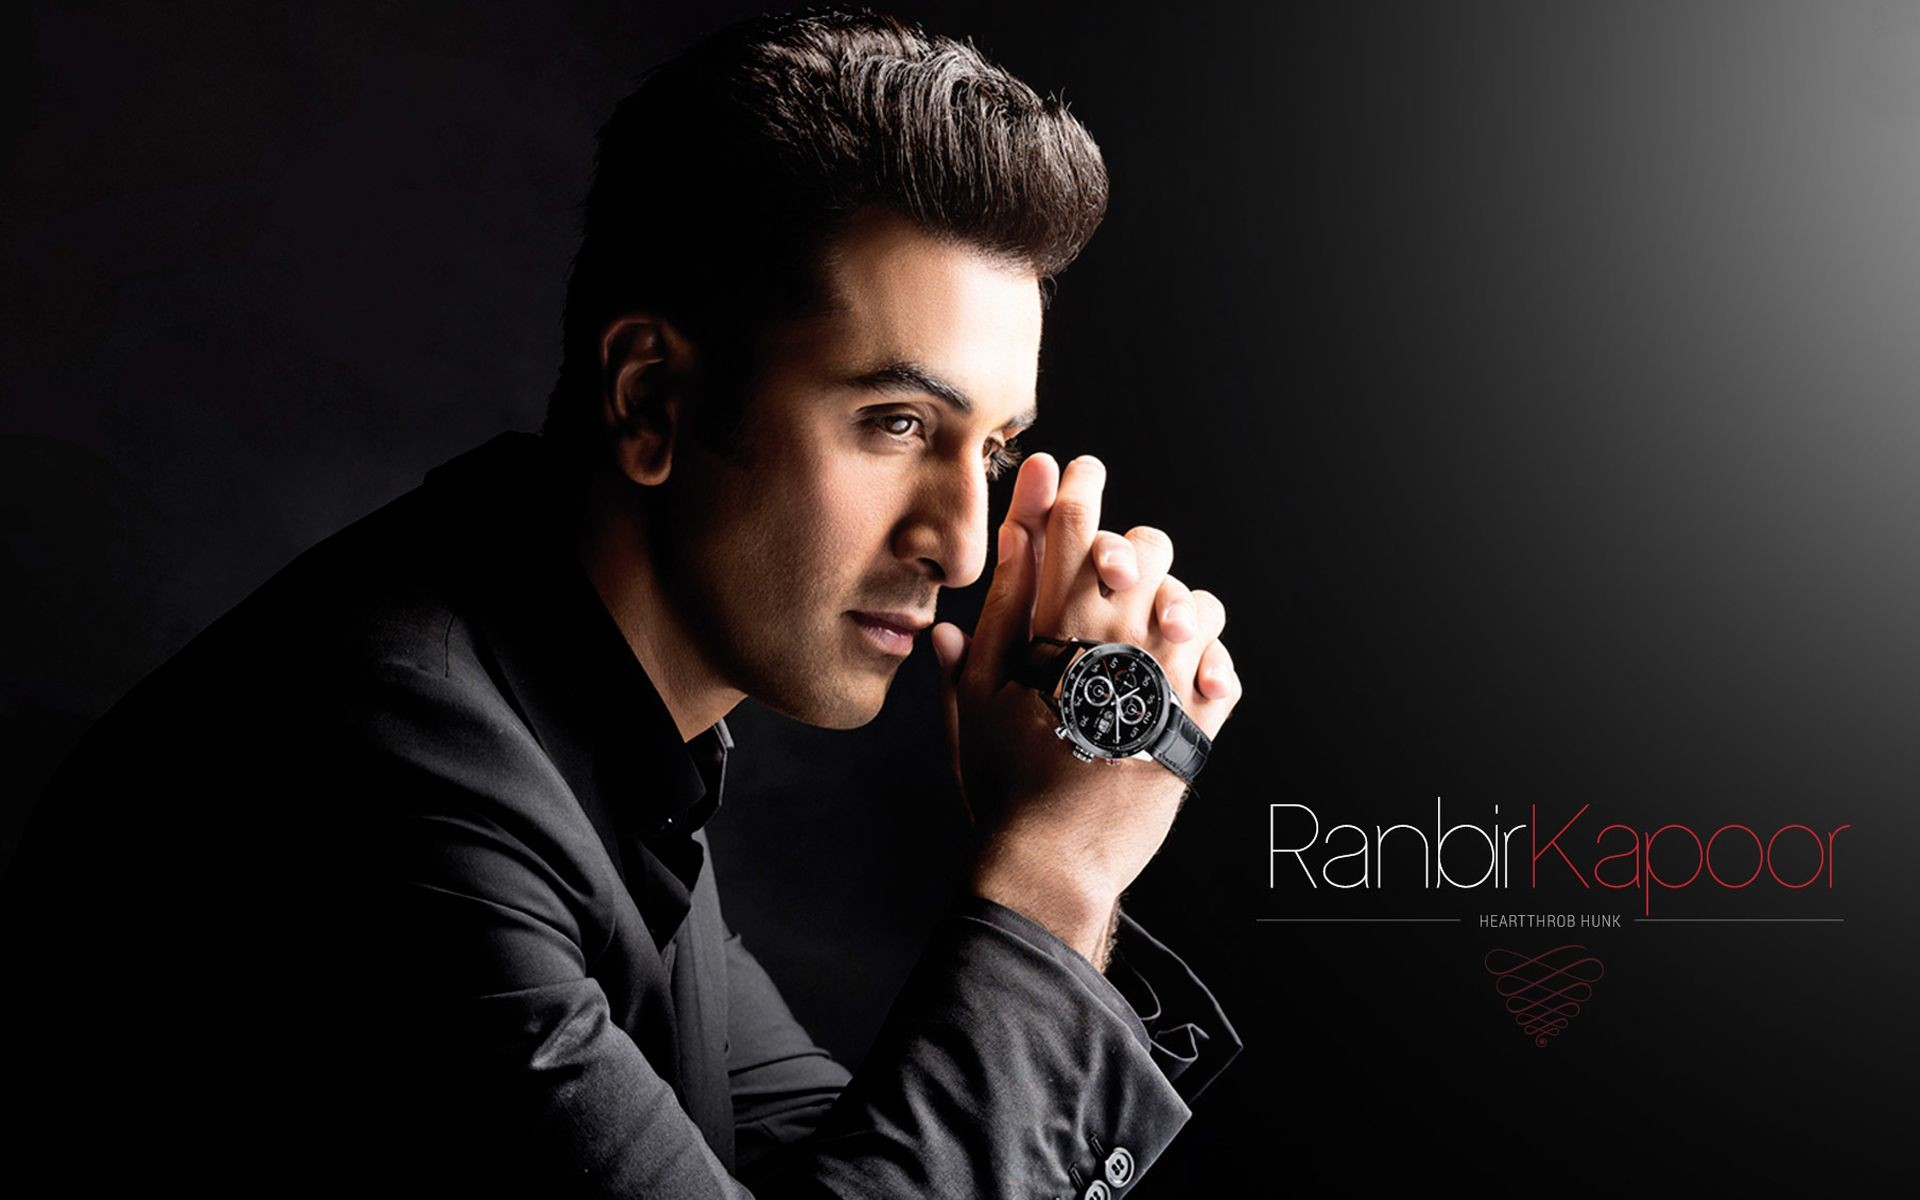 Res: 1920x1200, Dashing Ranbir Kapoor HD Wallpaper Ranbir Kapoor , Bollywood, Actor, HD,  Wallpapers, Dashing, Images, Pictures, Photos, Charming, Chocolaty,  Rocking, Hot, ...